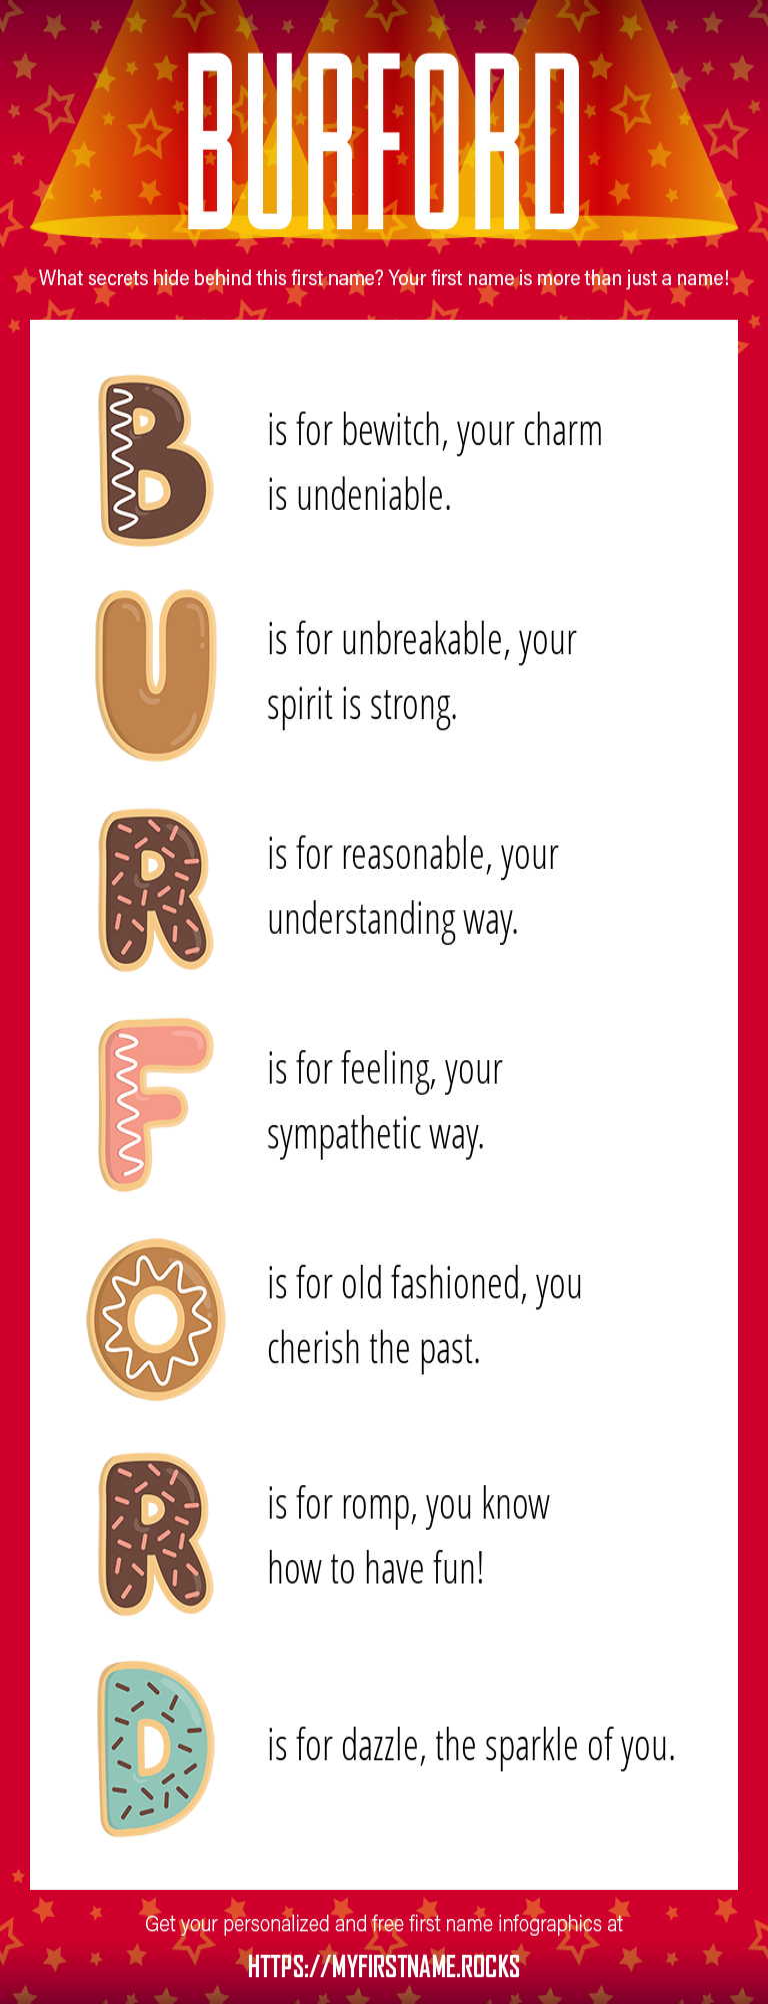 Burford Infographics